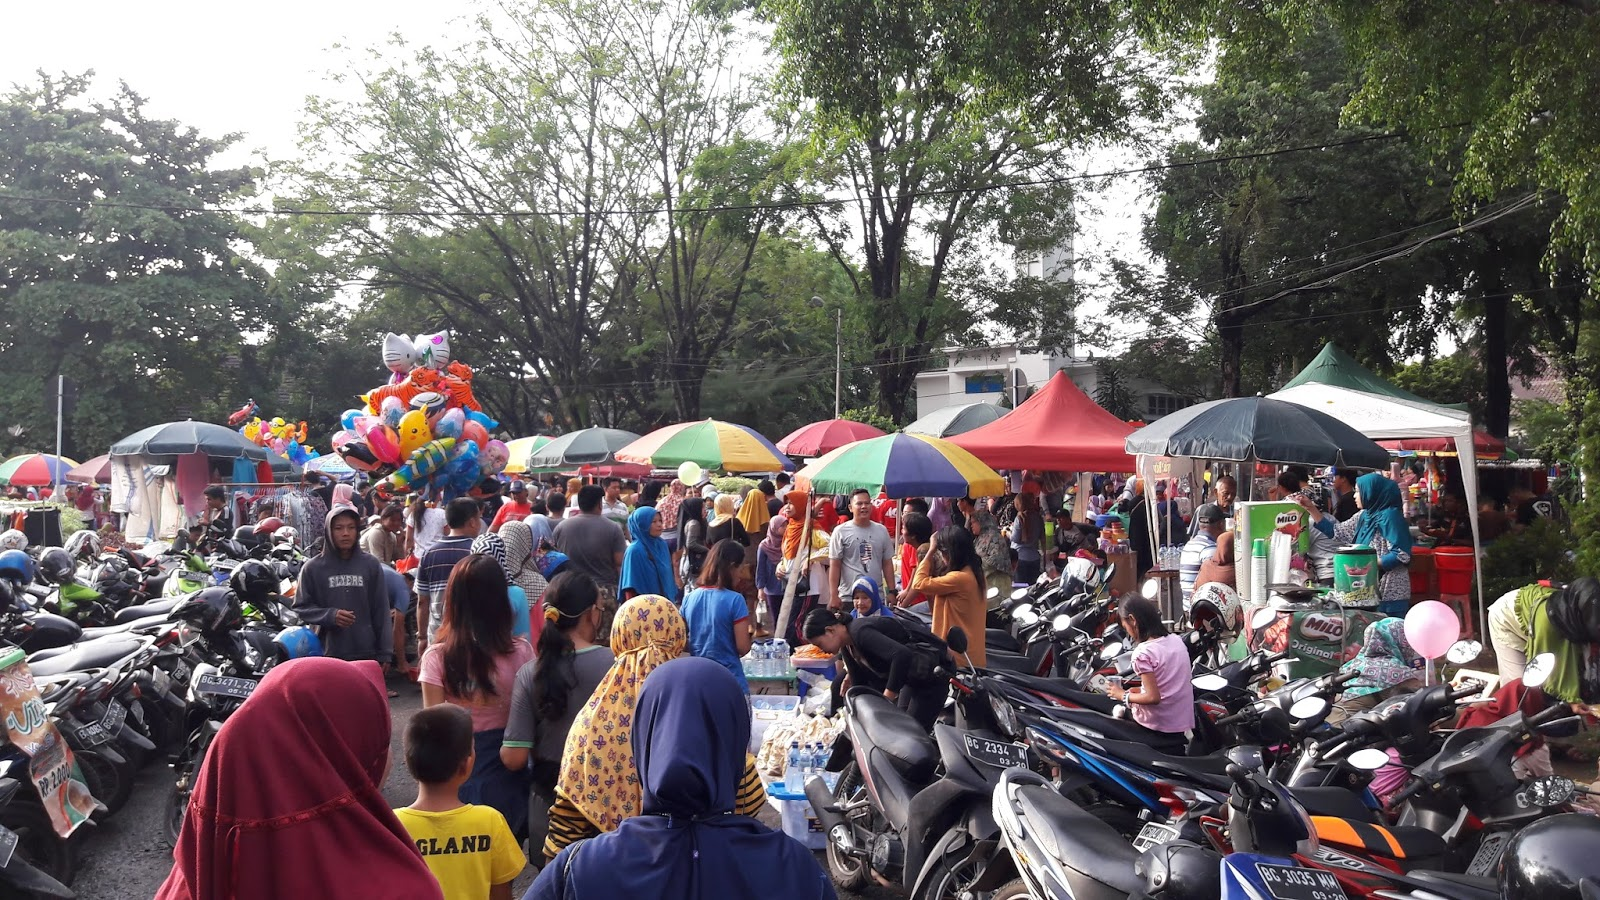 Digital Paper Car Free Day Minggu Pagi Kambang Iwak Family